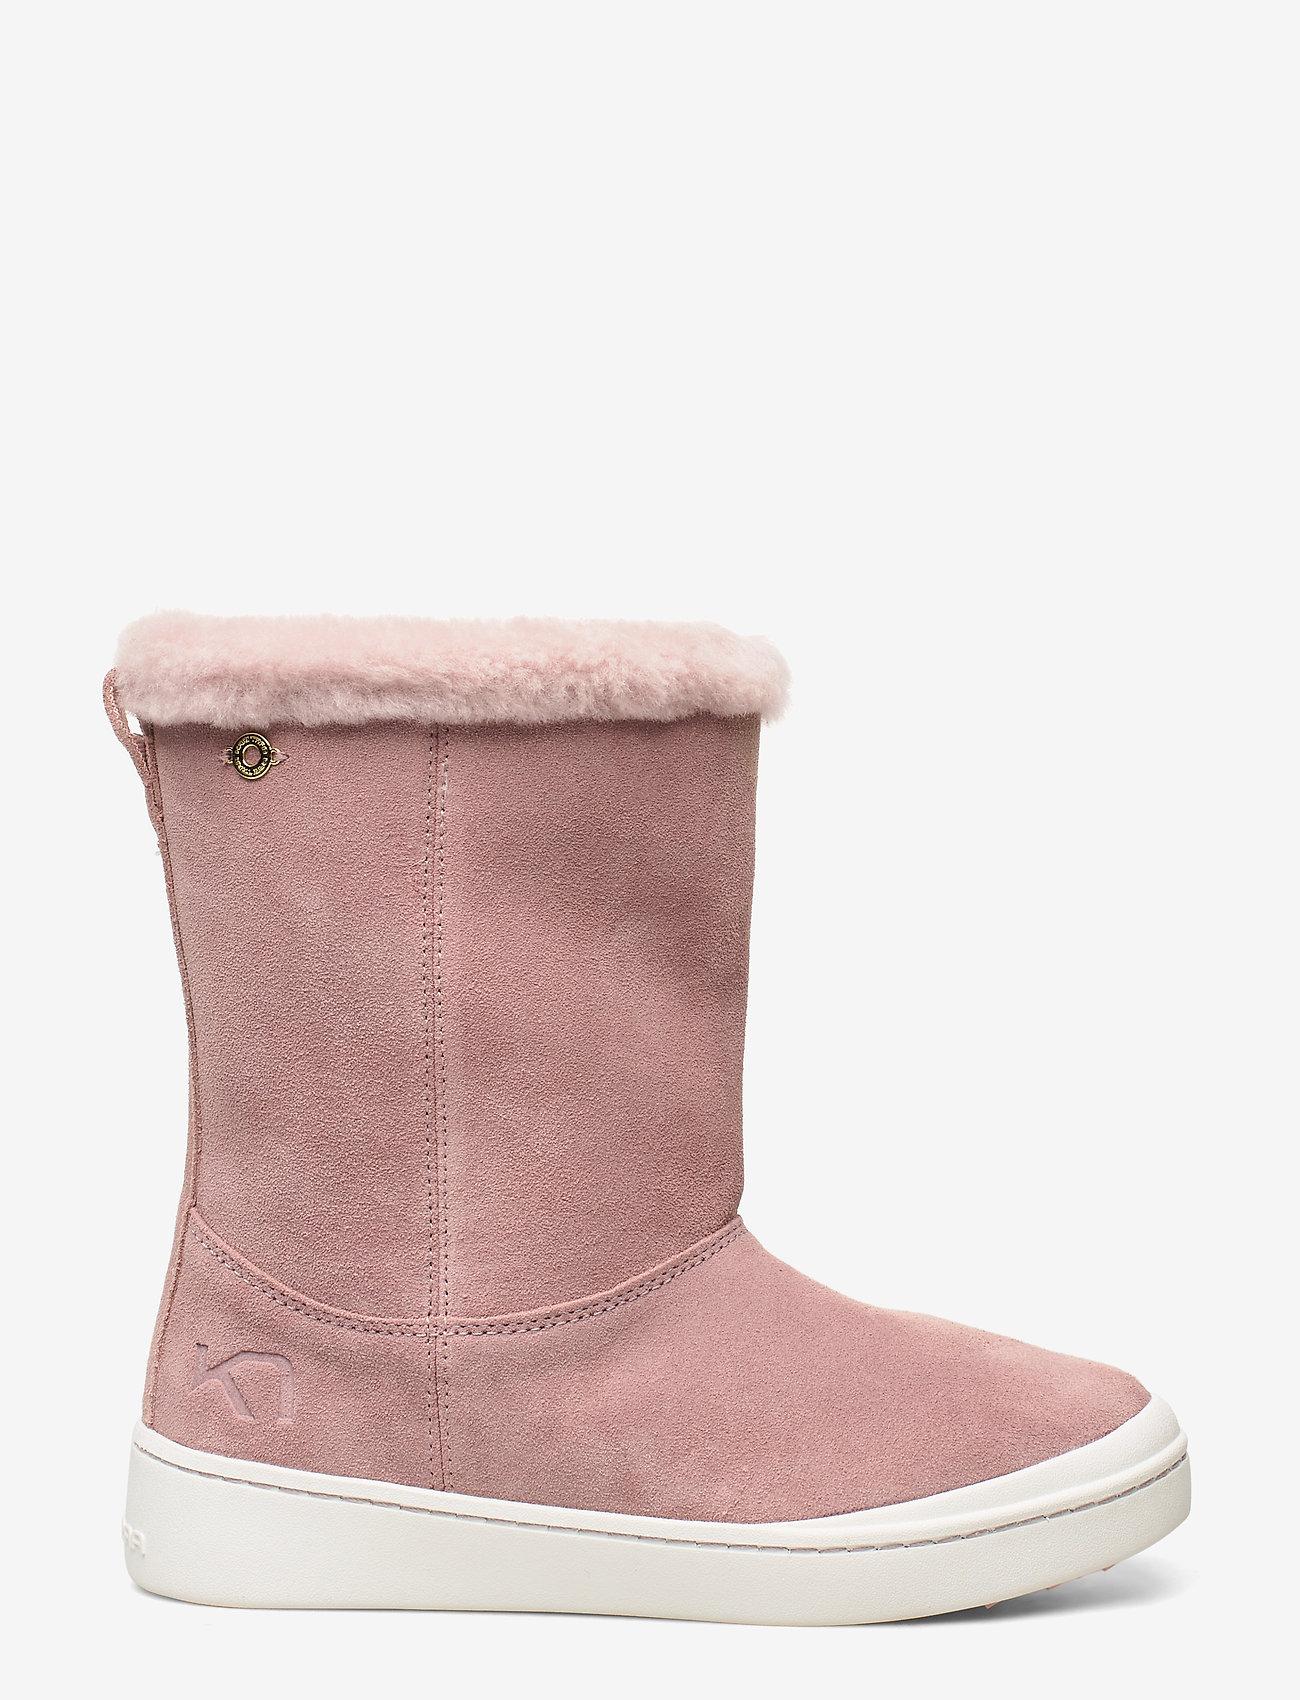 Kari Traa - STEG - flat ankle boots - petal - 1